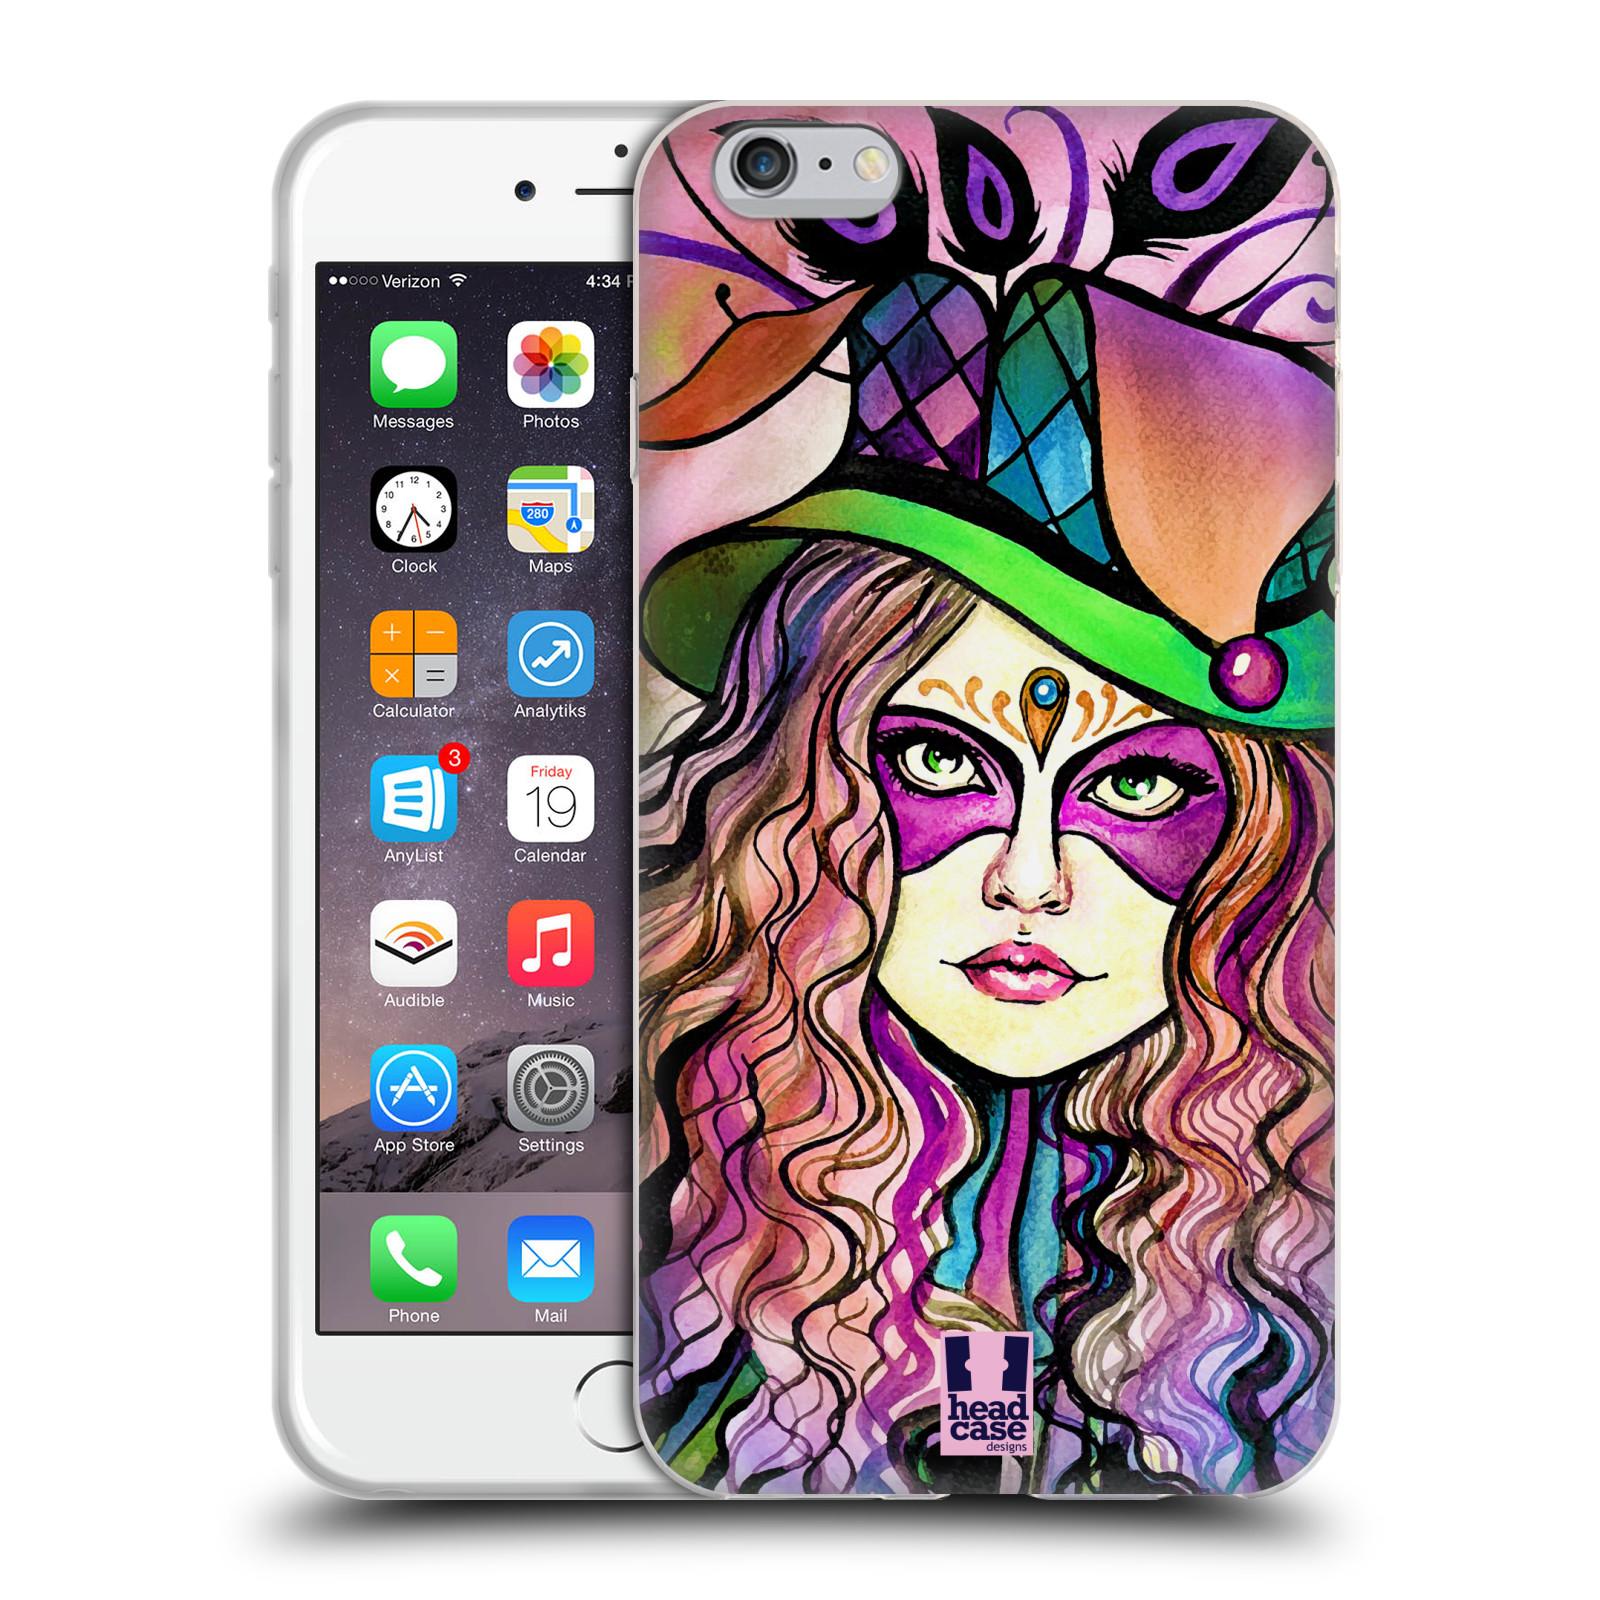 HEAD CASE silikonový obal na mobil Apple Iphone 6 PLUS/ 6S PLUS vzor Maškarní ples masky kreslené vzory KLOBOUK